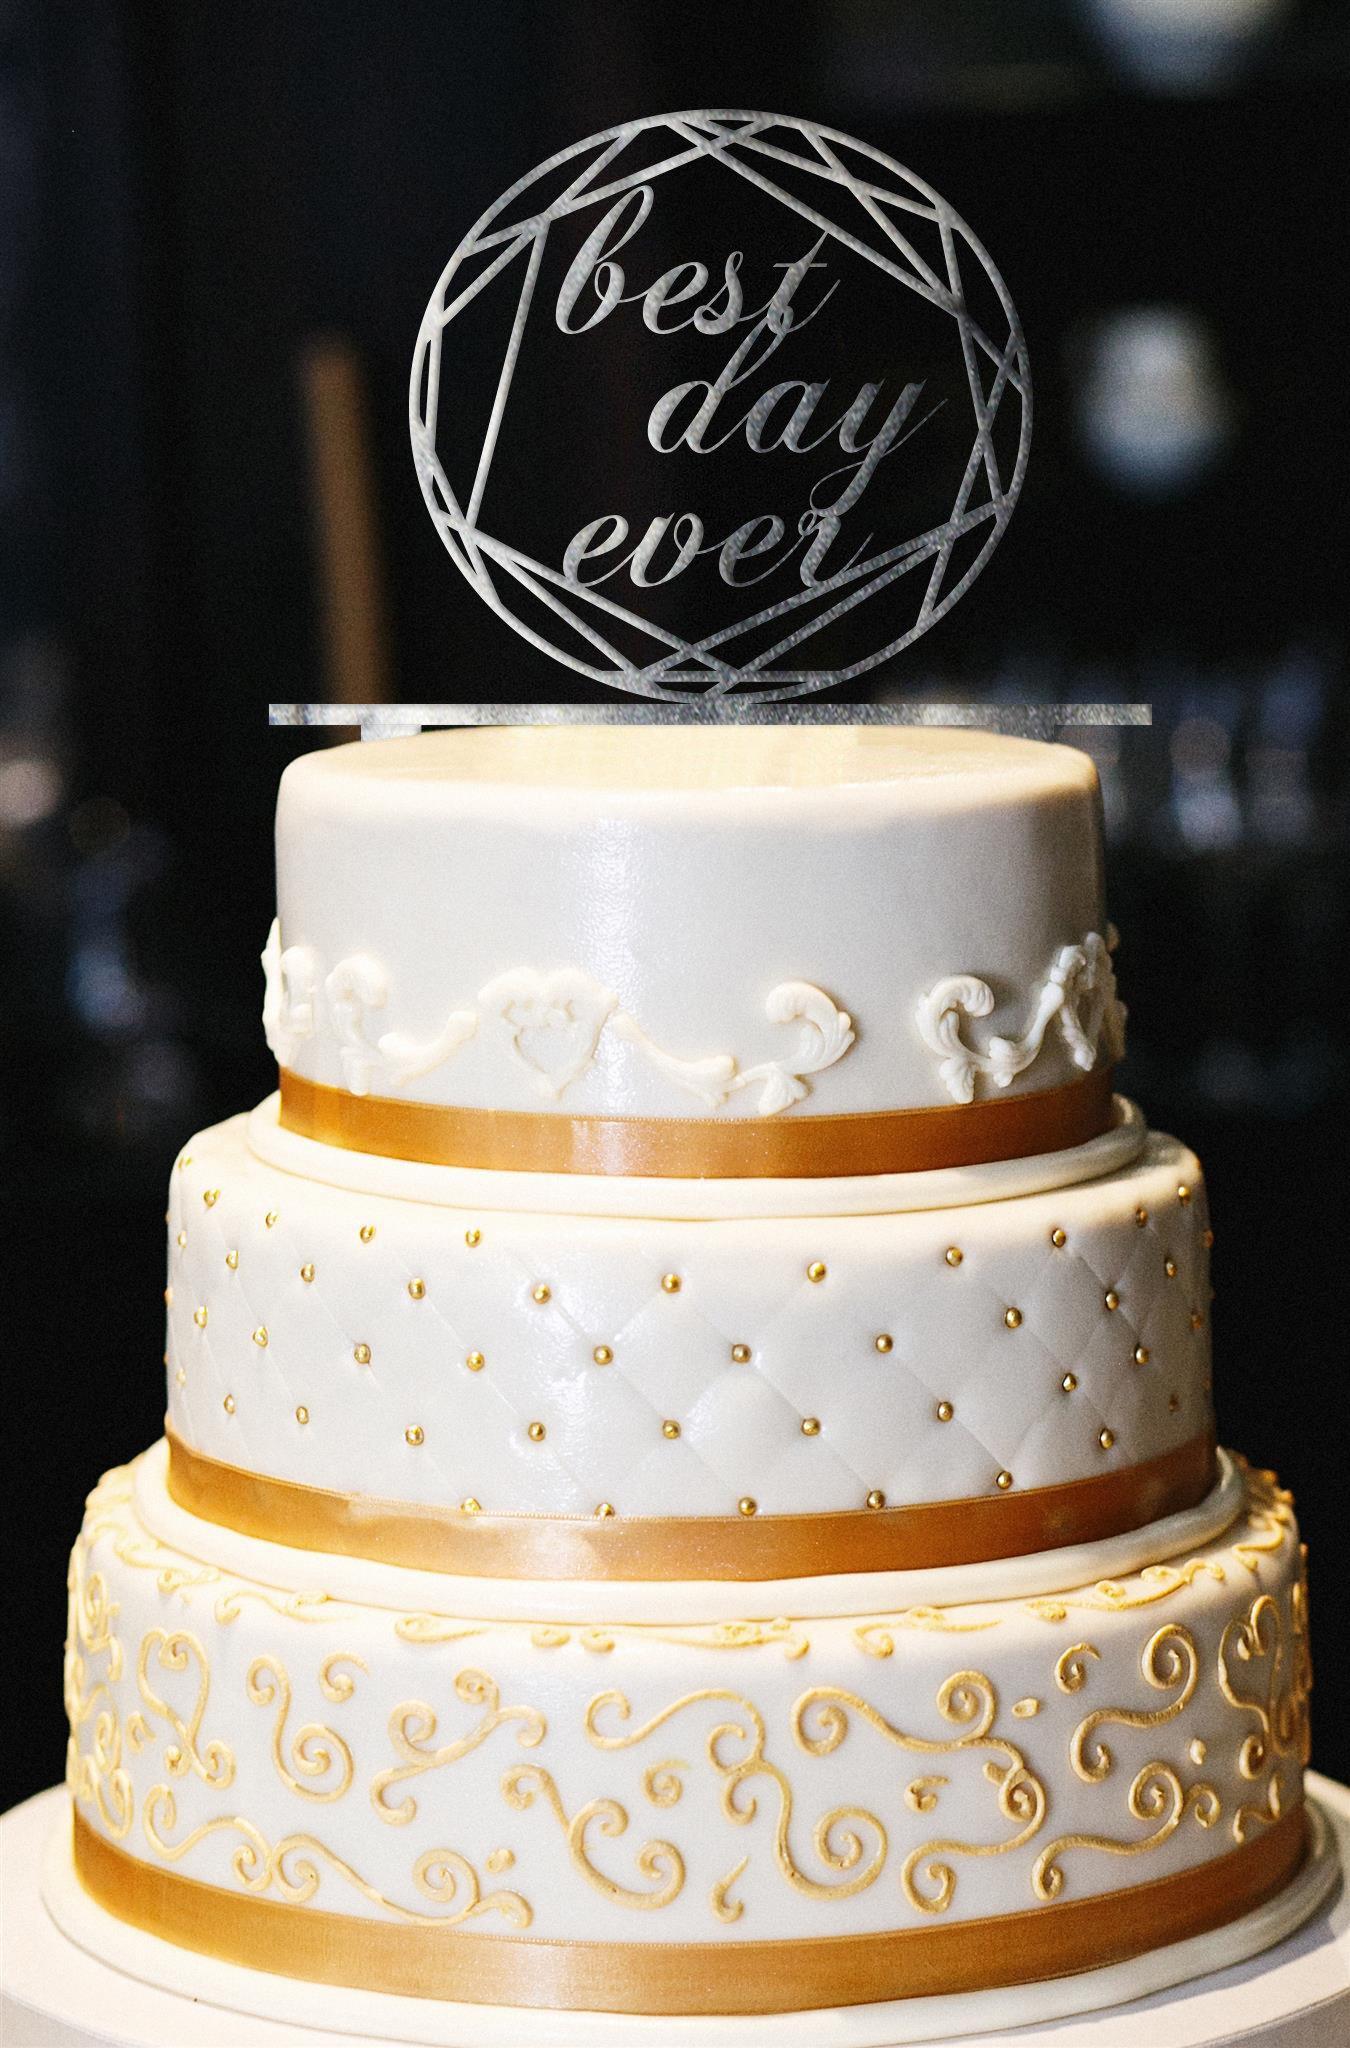 Best Day Ever Wedding Cake Topper, Wedding Cake Topper, Engagement Cake Topper, Gold Cake Topper, Gold Glitter Cake Topper, Anniversary (13'', Pearl Smoke)